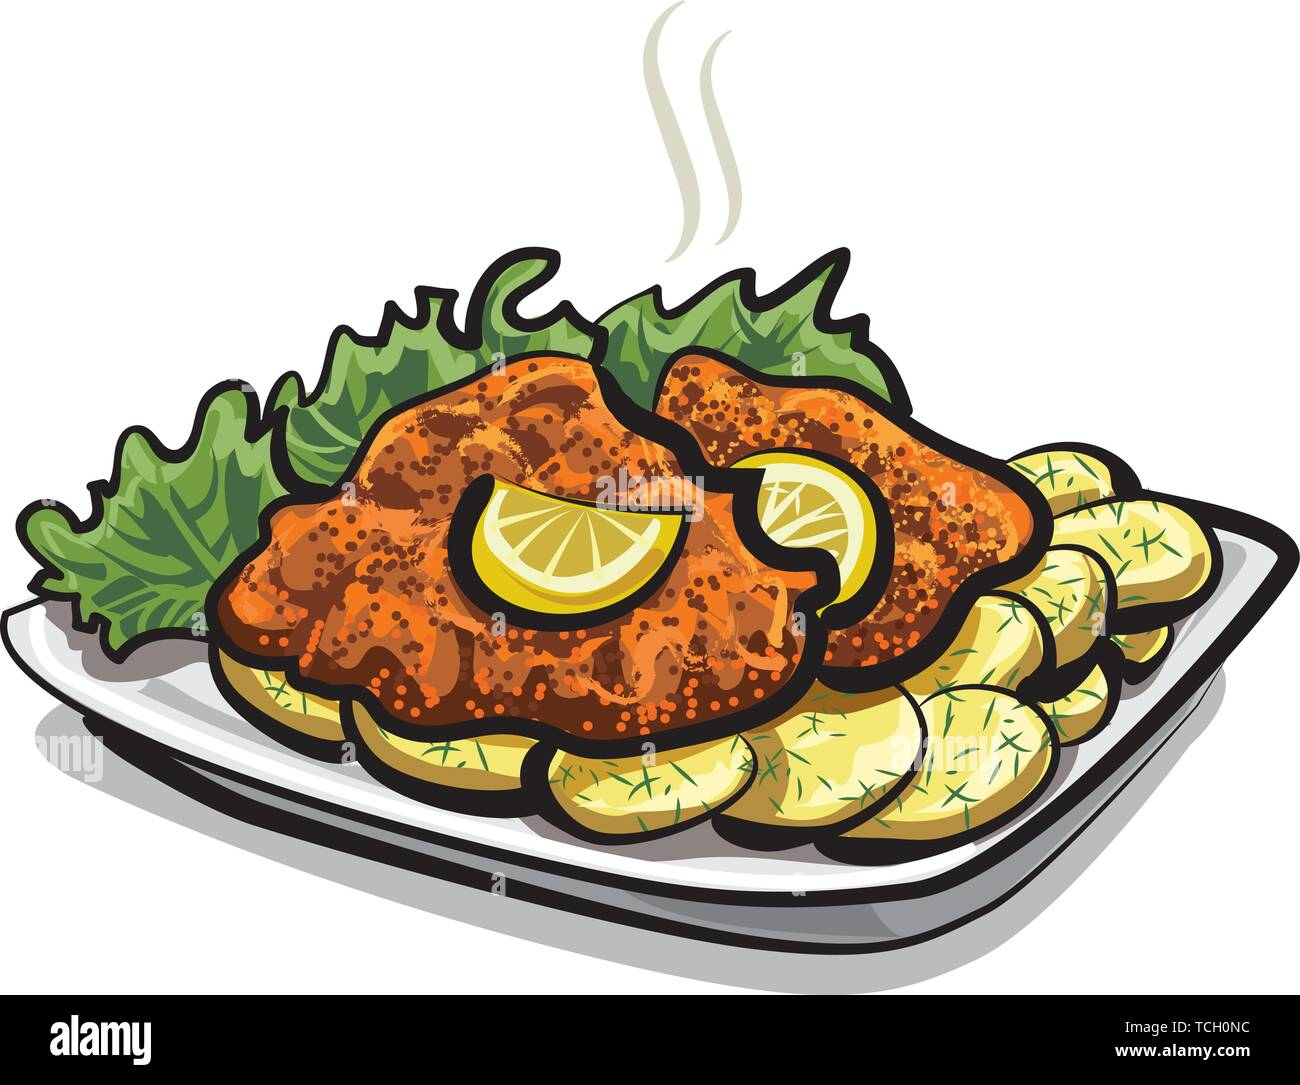 roasted schnitzel - Stock Vector